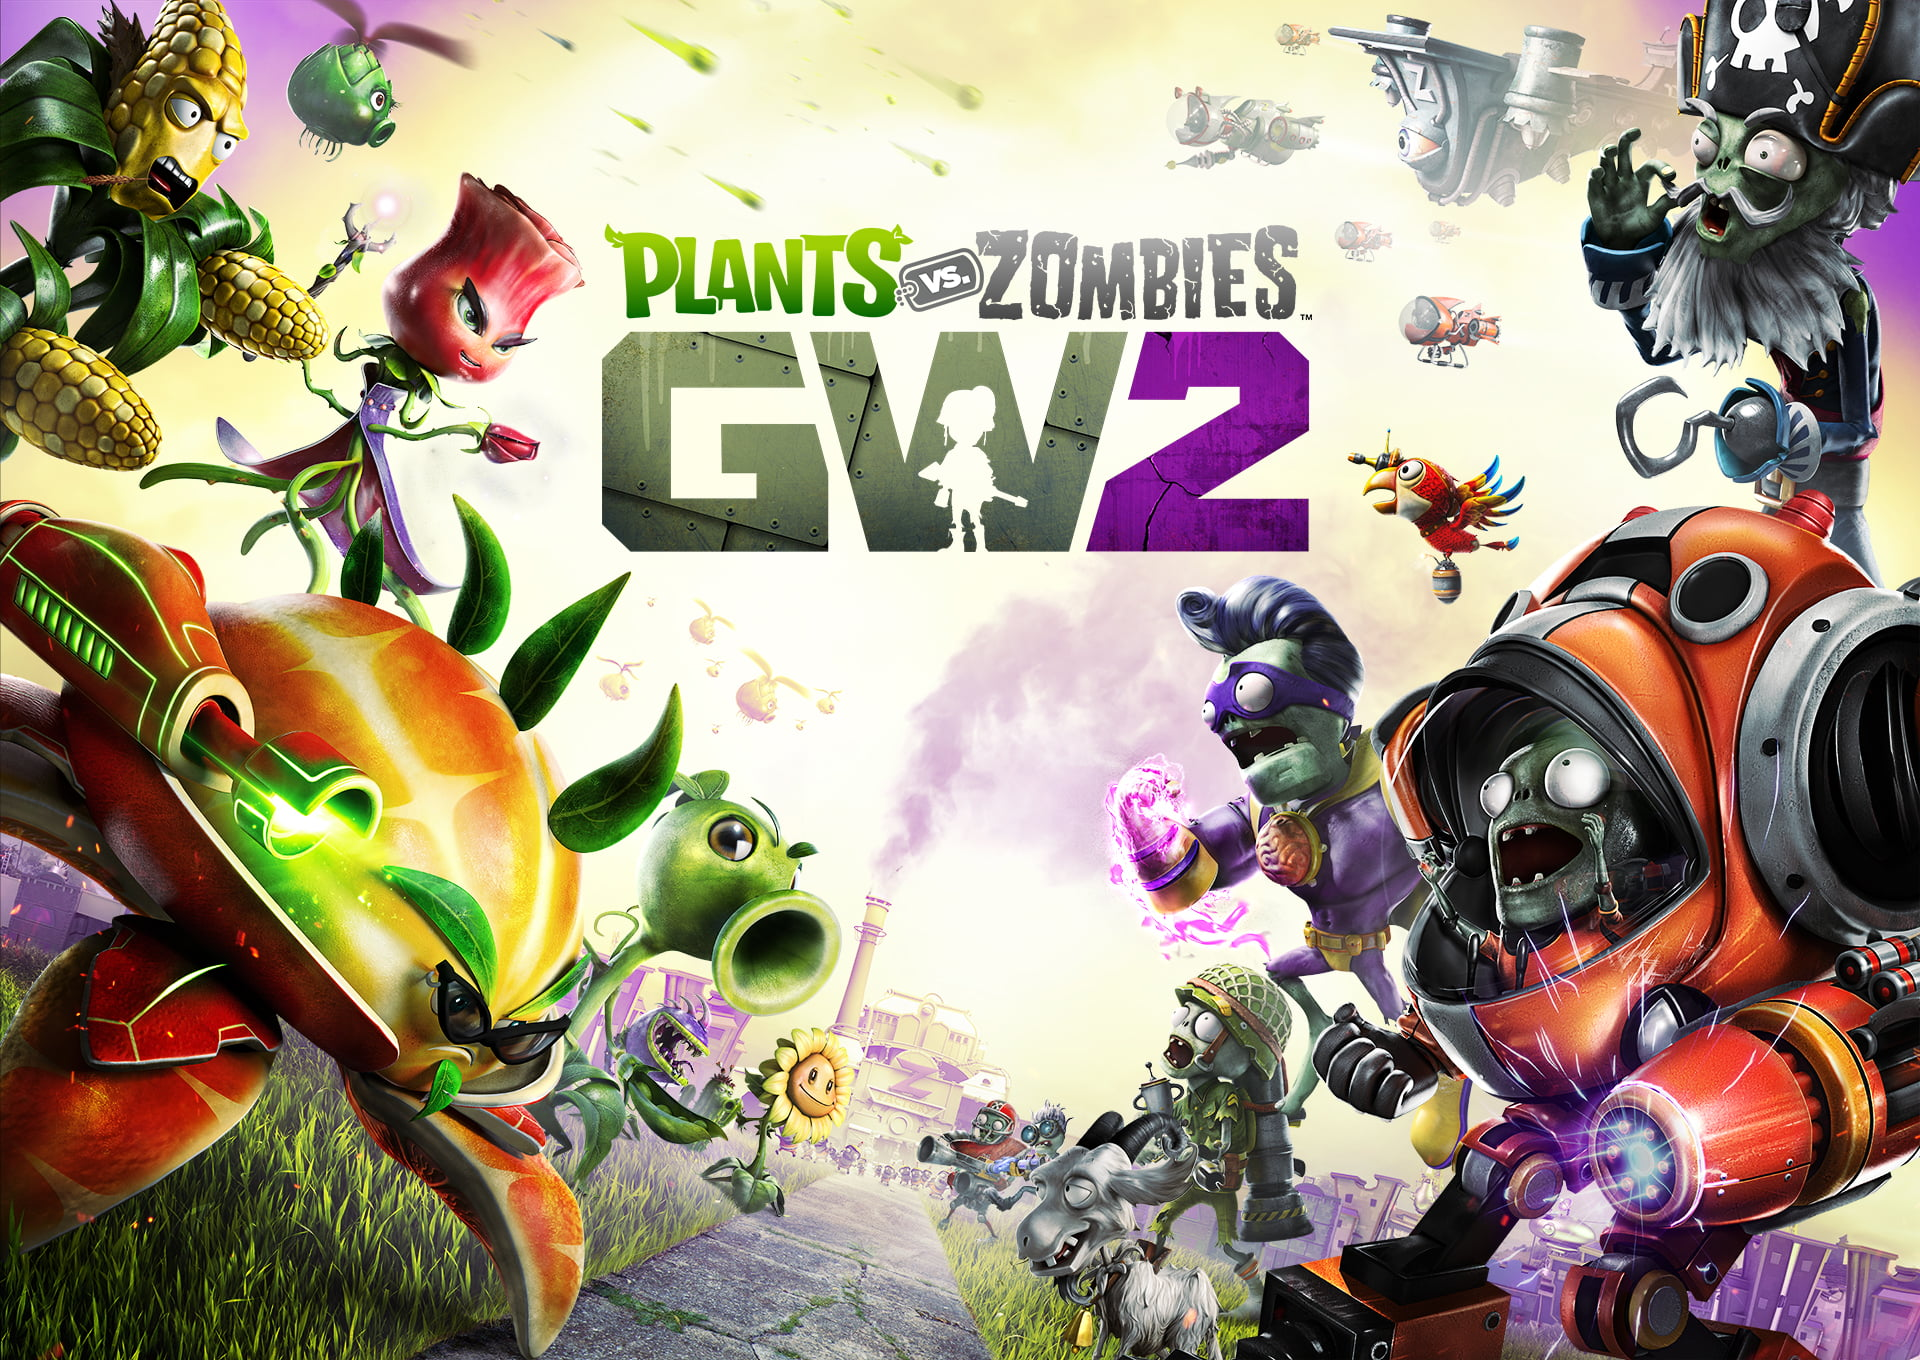 Imagen promocional de Plants vs Zombies Garden Warfare 2